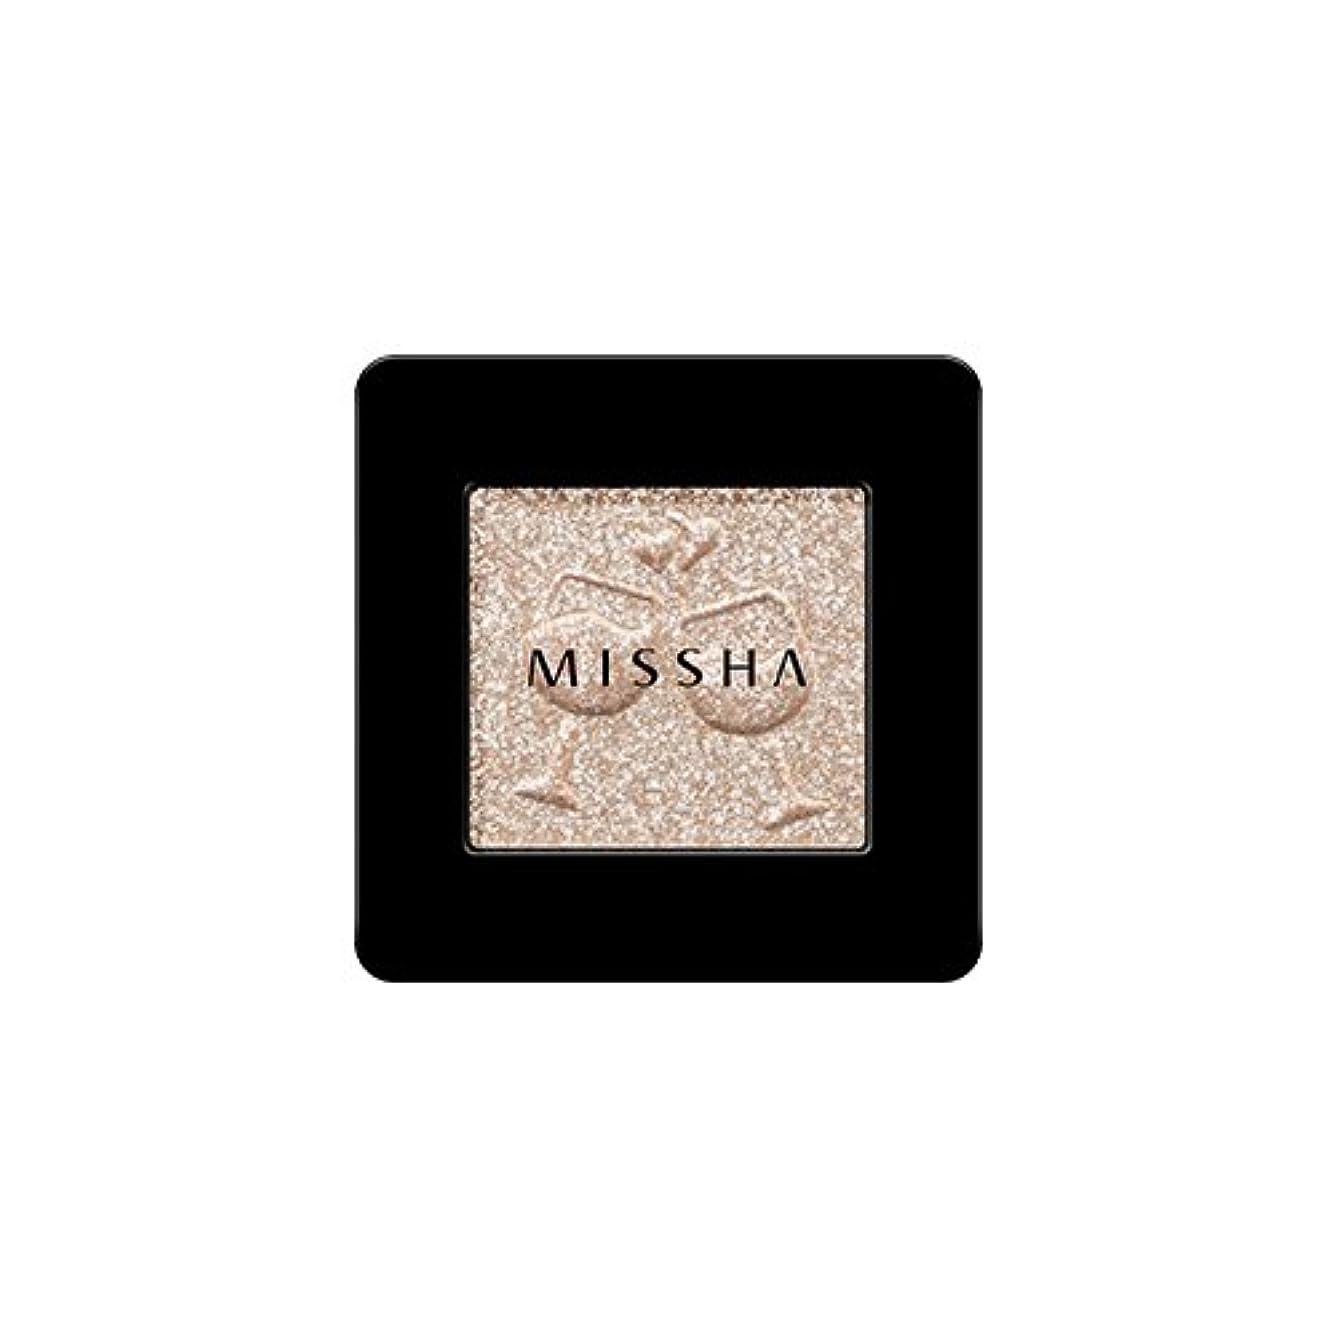 [2016 F/W New Color] MISSHA Modern Shadow [Glitter]/ミシャ モダン シャドウ [グリッター] (#GBE03 Vanilla Champagne)